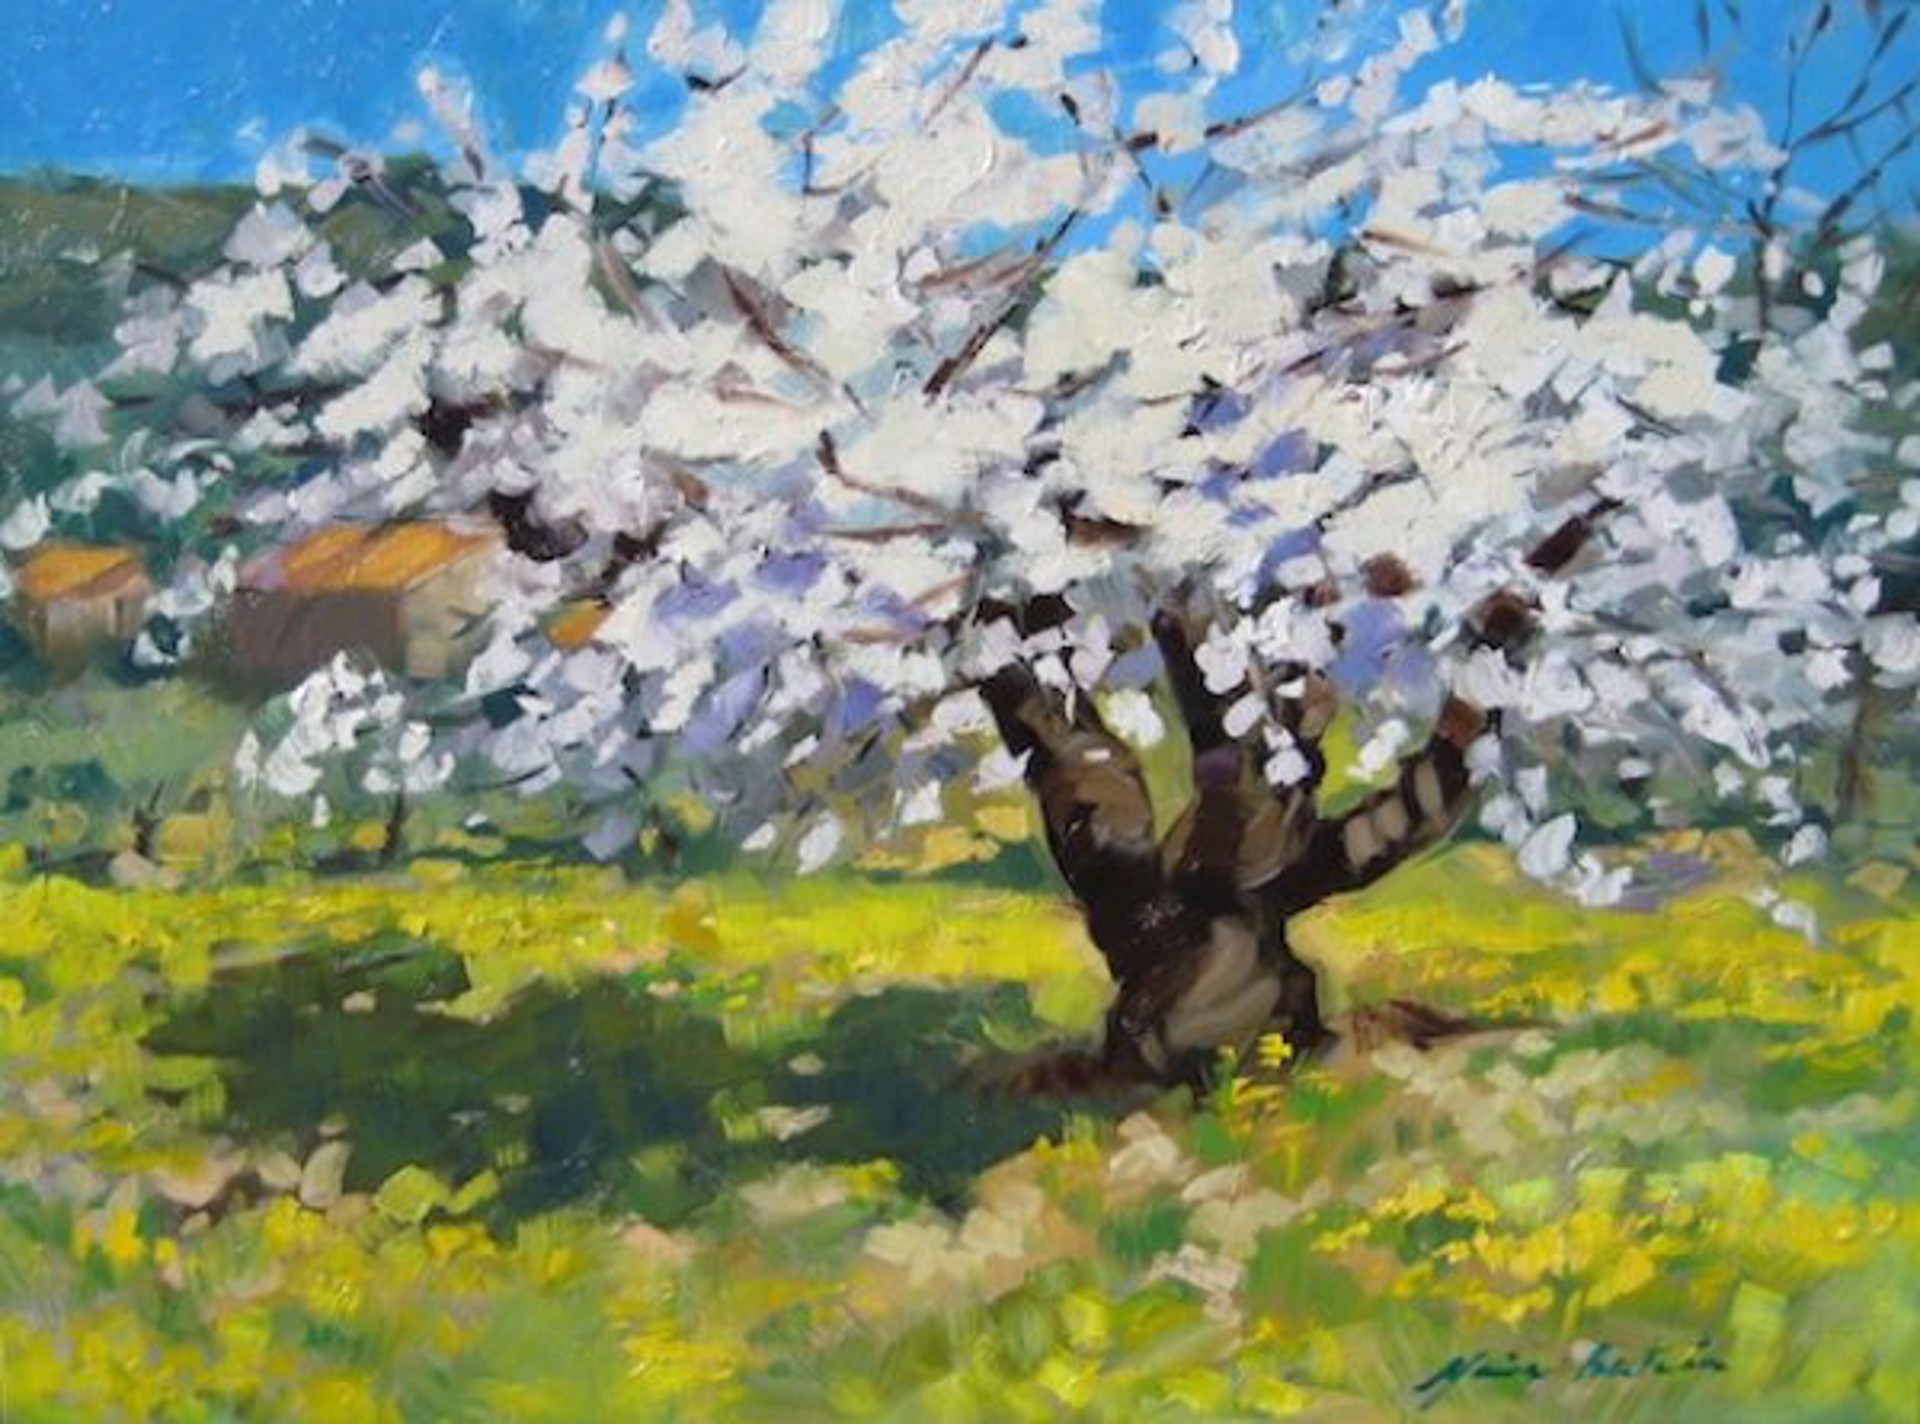 Tree Full Of Cherry Blossoms by Maria Bertrán